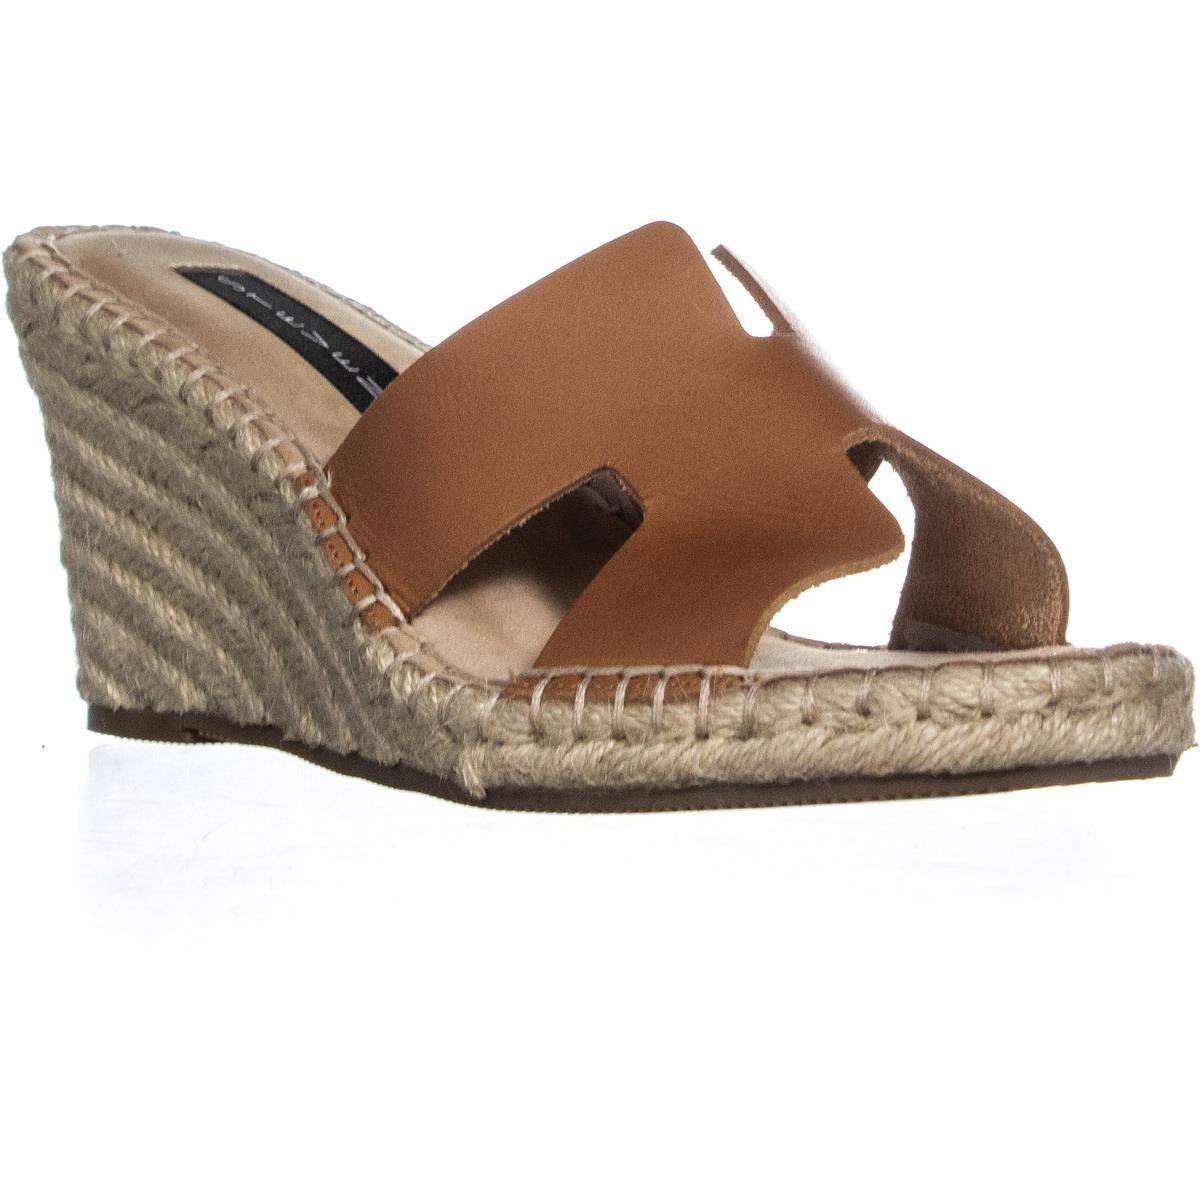 d3141aef59b STEVEN Steve Madden Eryk Wedge Sandals, Cognac Leather - 6.5 us